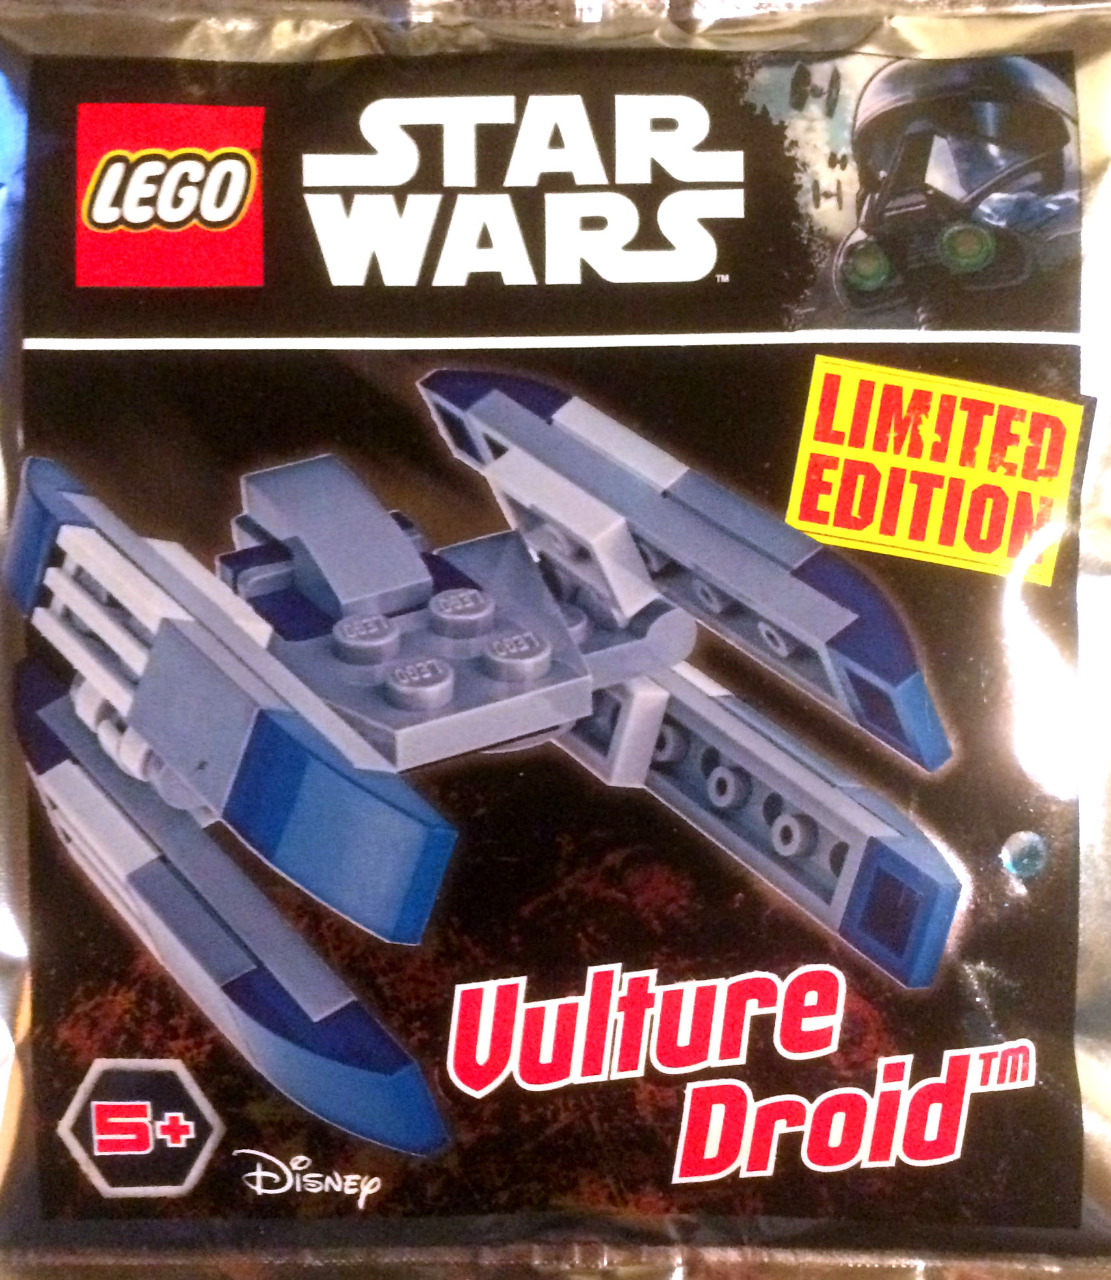 SHUTTLE PILOT FLASH SPEEDER 5x Lego STAR WARS: VULTURE DROID COMBAT DRIVER